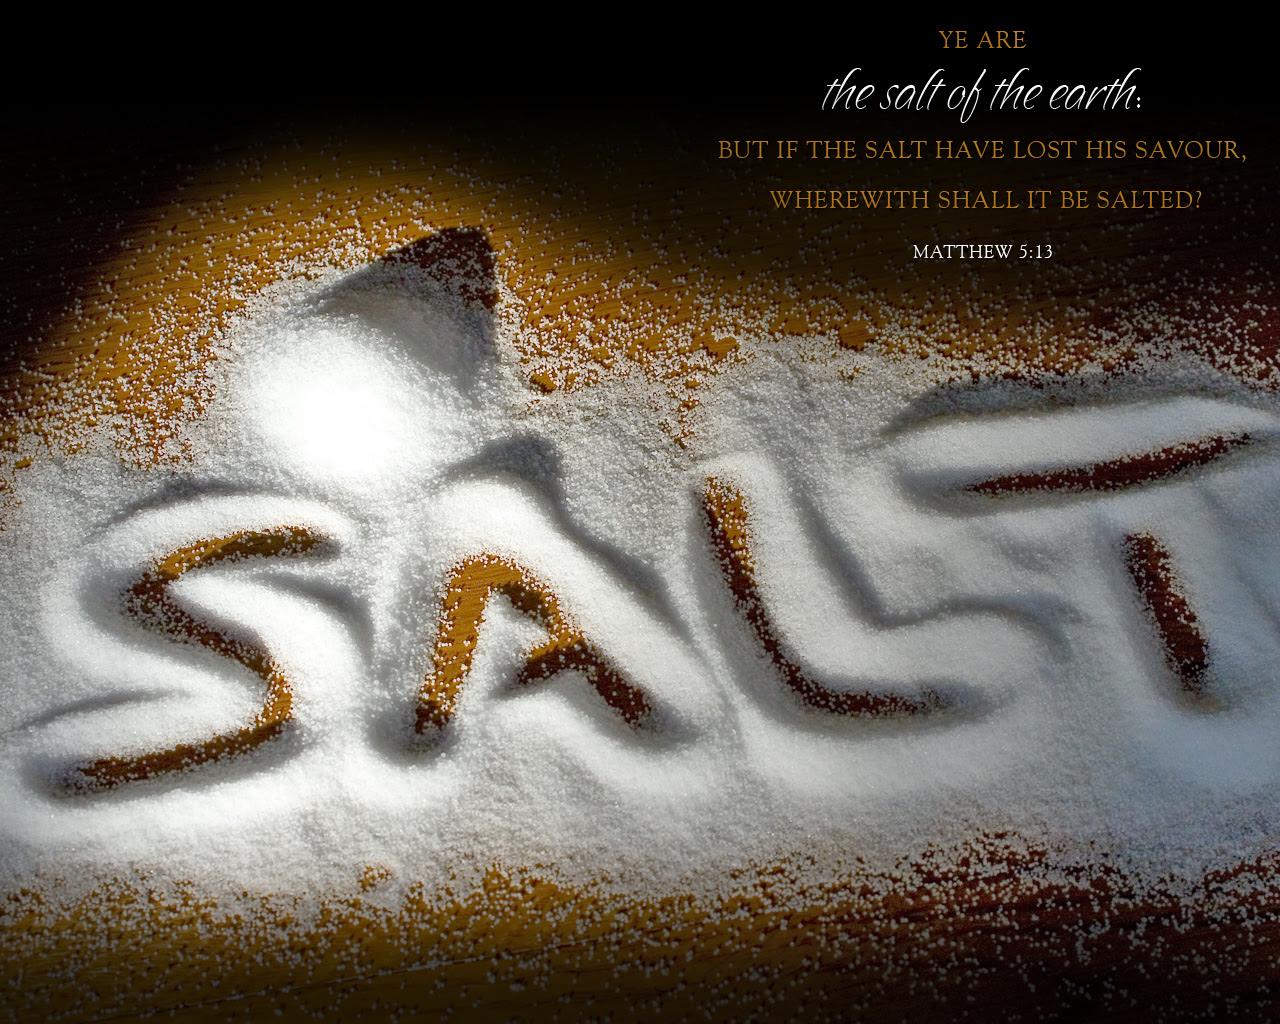 http://candidkerry.files.wordpress.com/2011/08/salt_of_the_earth11.jpg